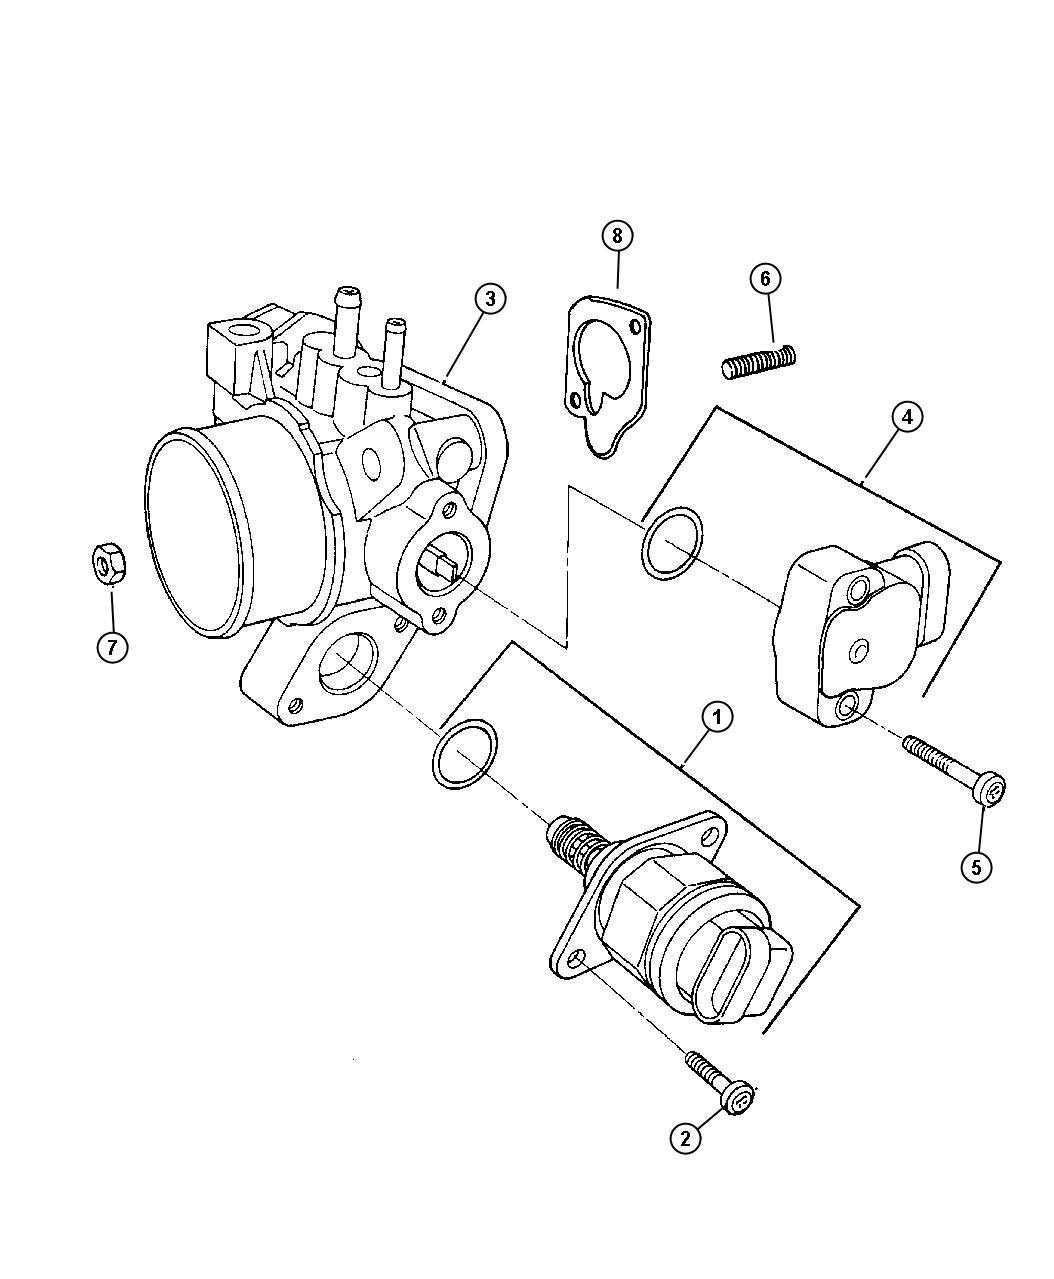 Dodge Caravan Motor. A.i.s. With (edv) engine - 04861164AB ...